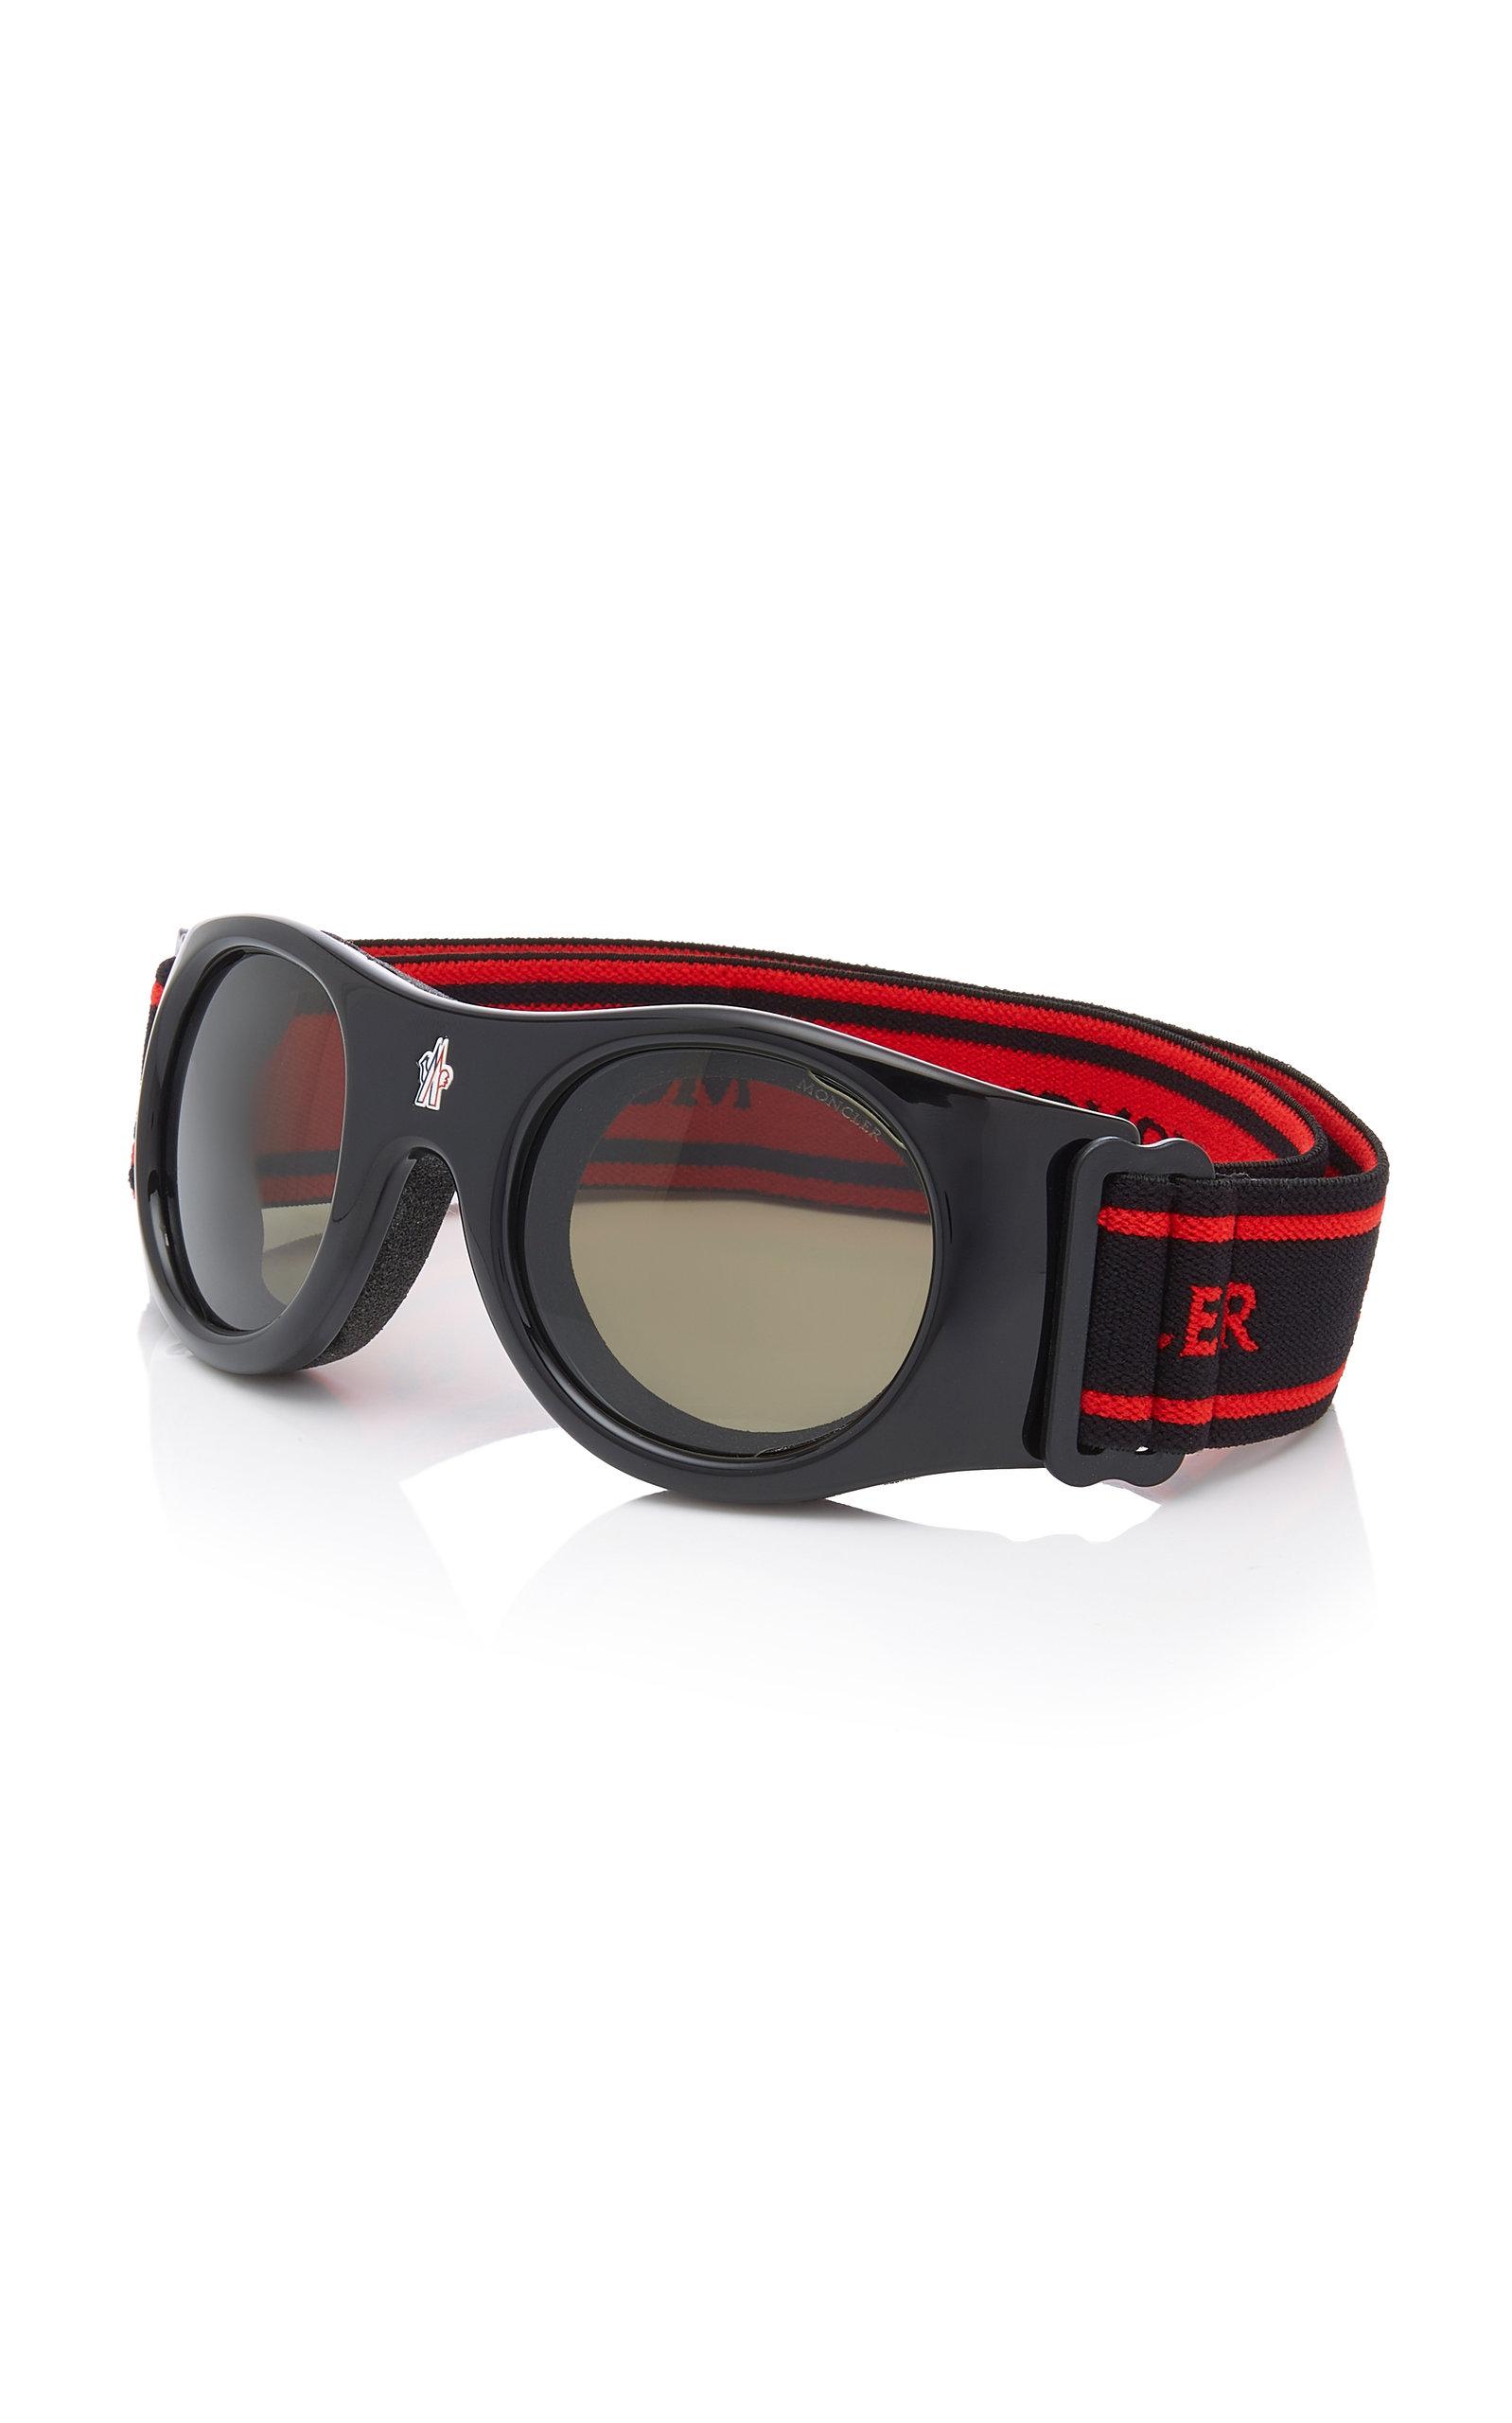 d518826e3da Moncler sunglasses Round-Frame Ski Goggles. CLOSE. Loading. Loading